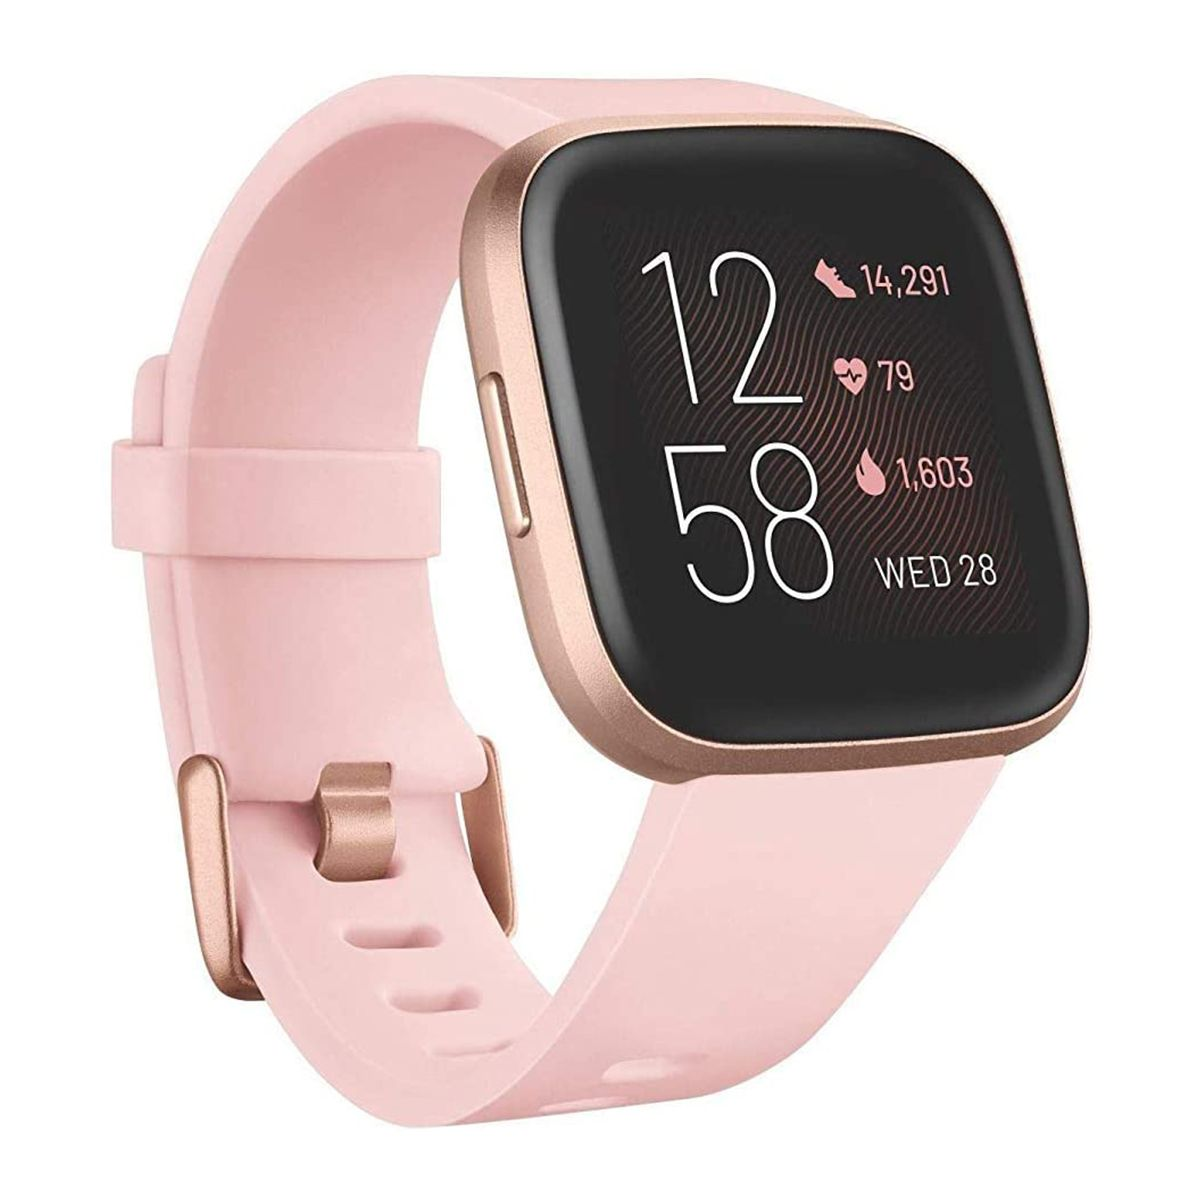 Fitbit versa 2 health and fitness smartwatch smart watch